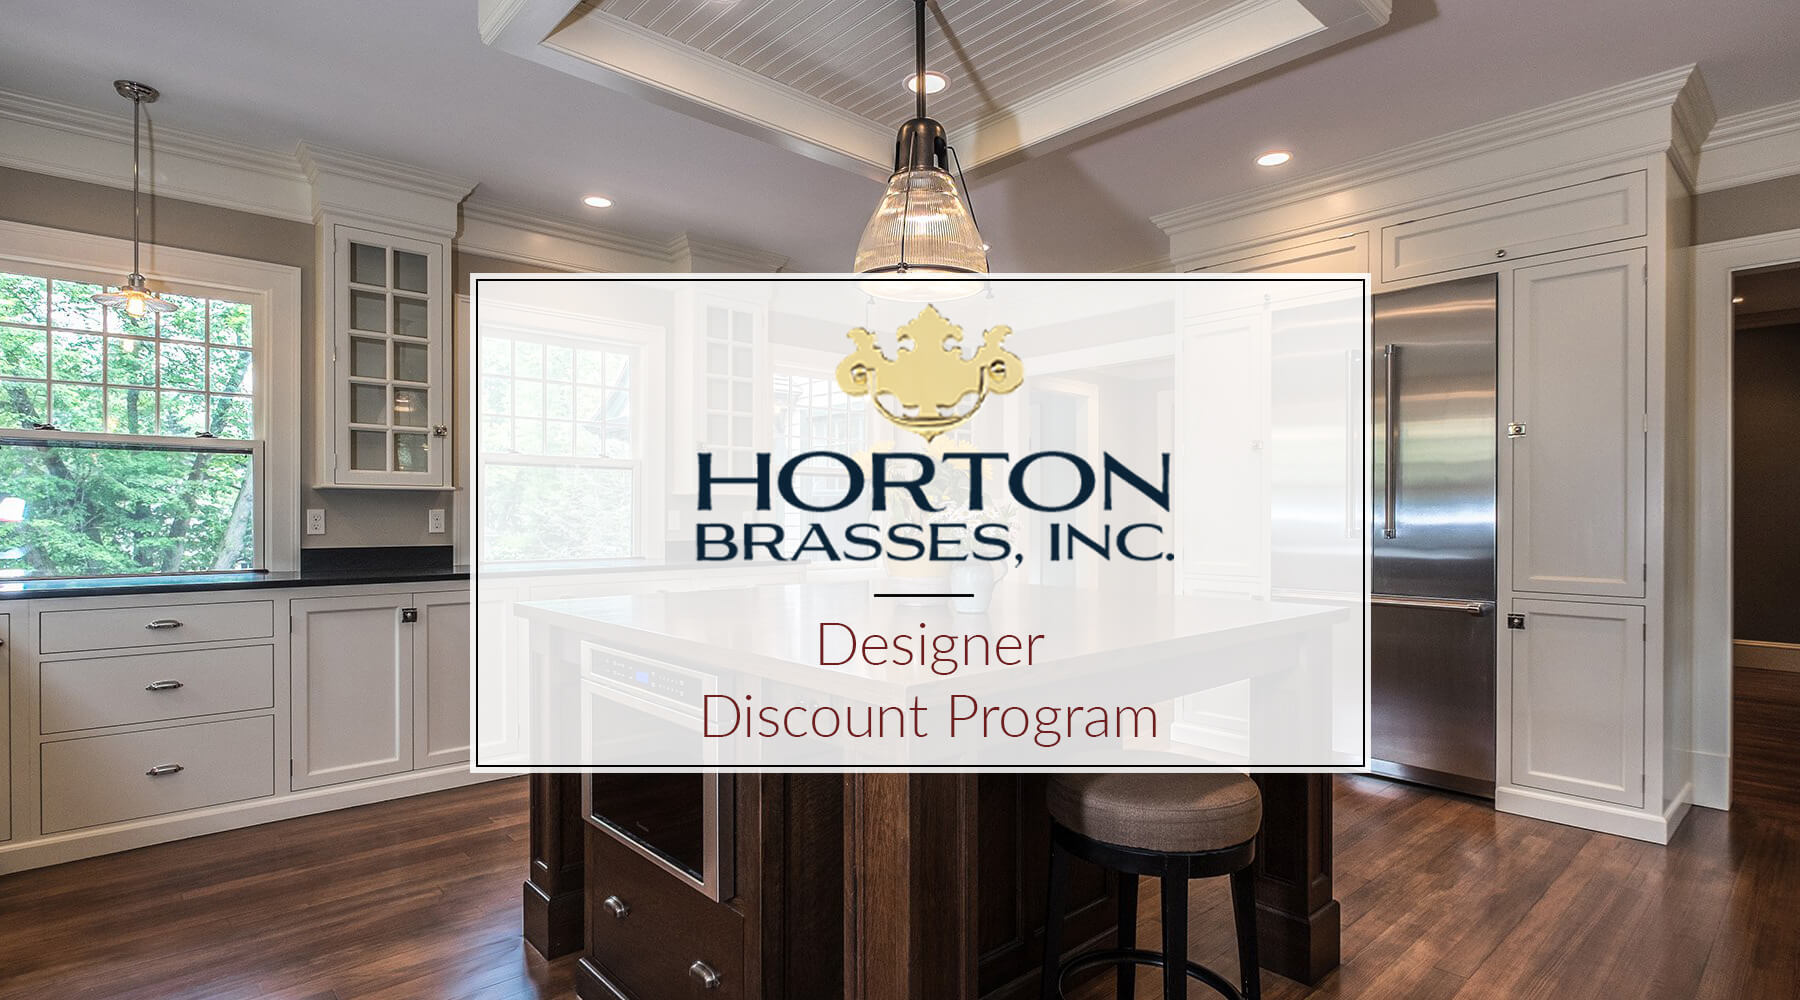 Designer Discount Program Horton Brasses